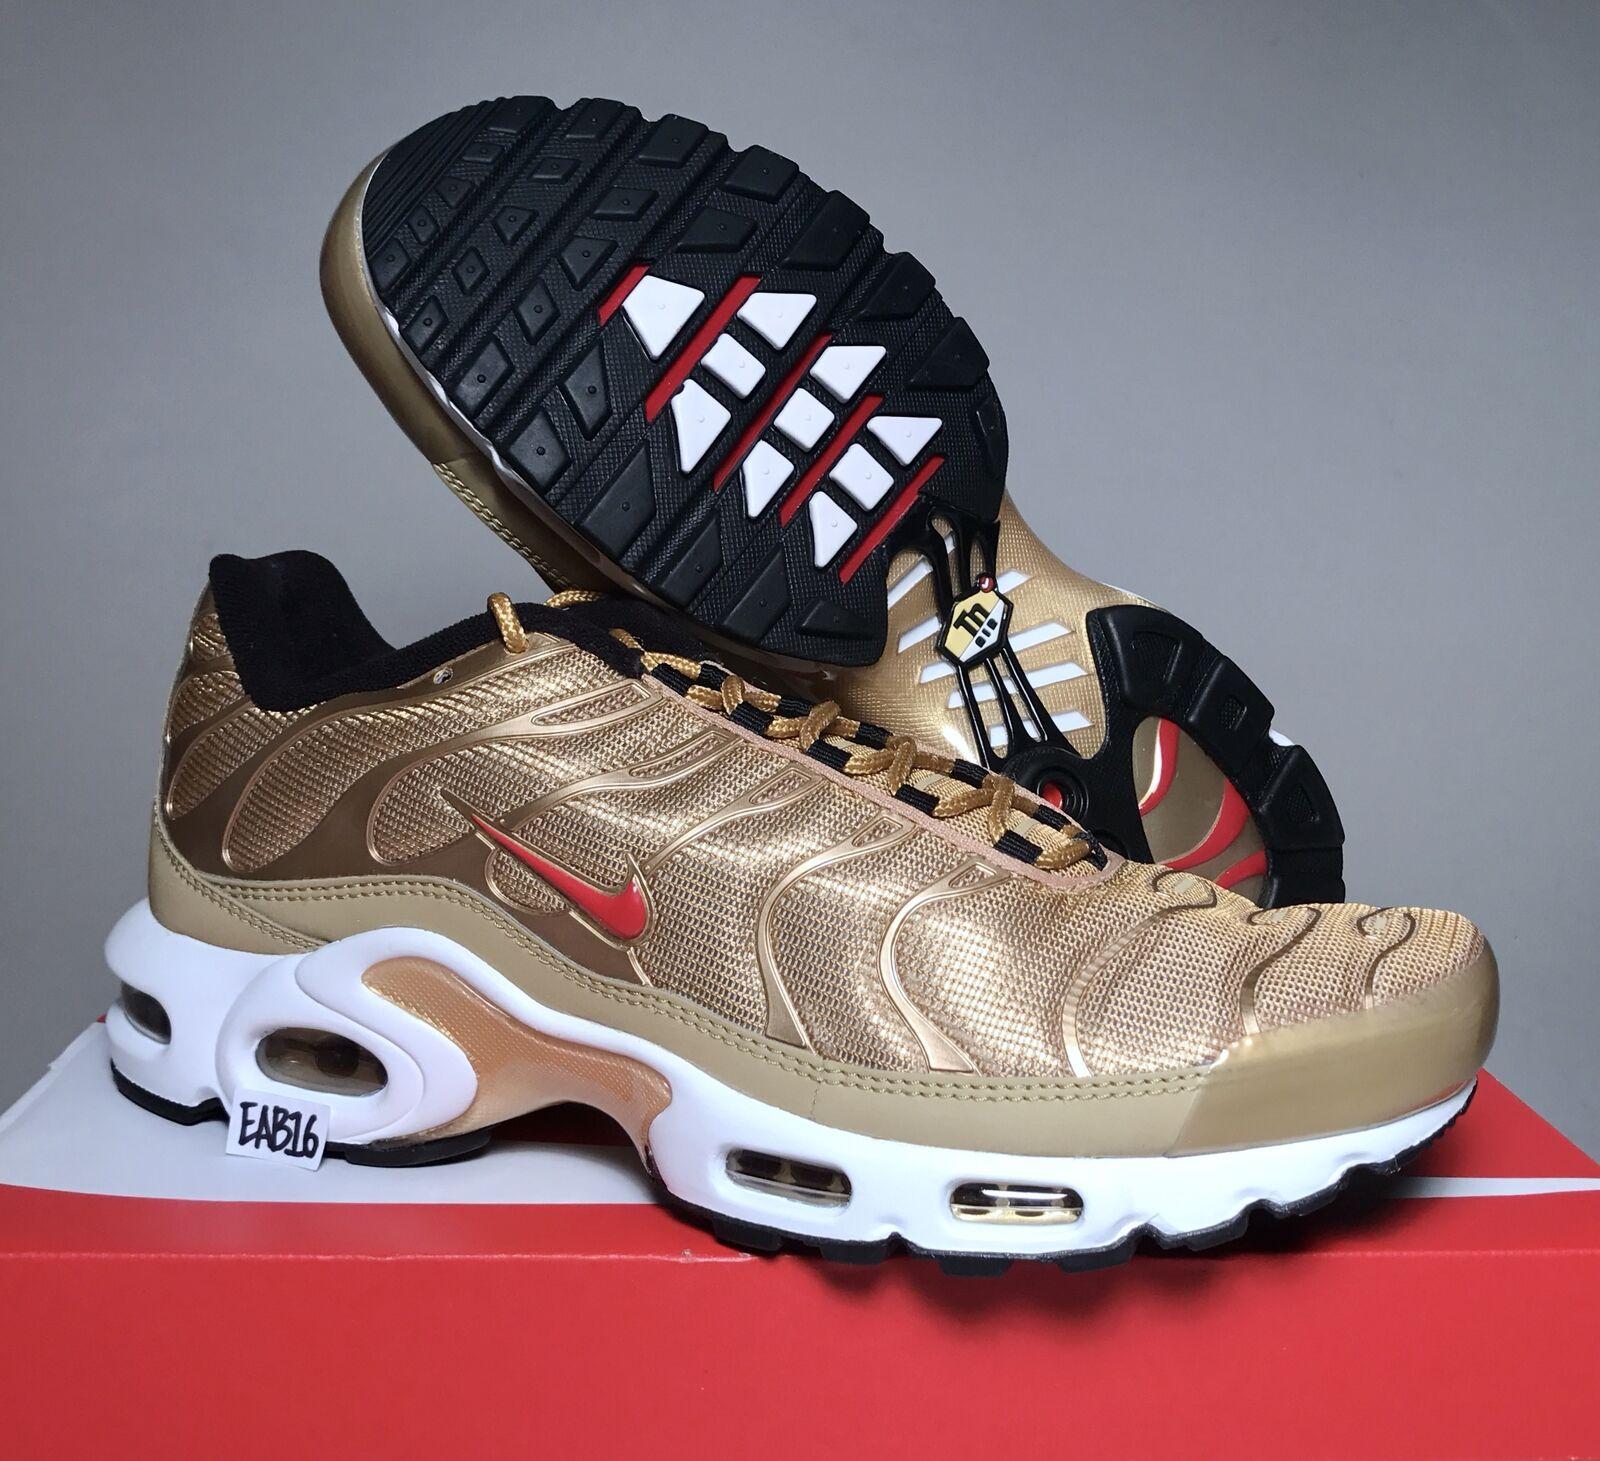 Nike air max inoltre qs in oro metallico 887092 700 2017 og dimensioni 1013 - bianco - rosso